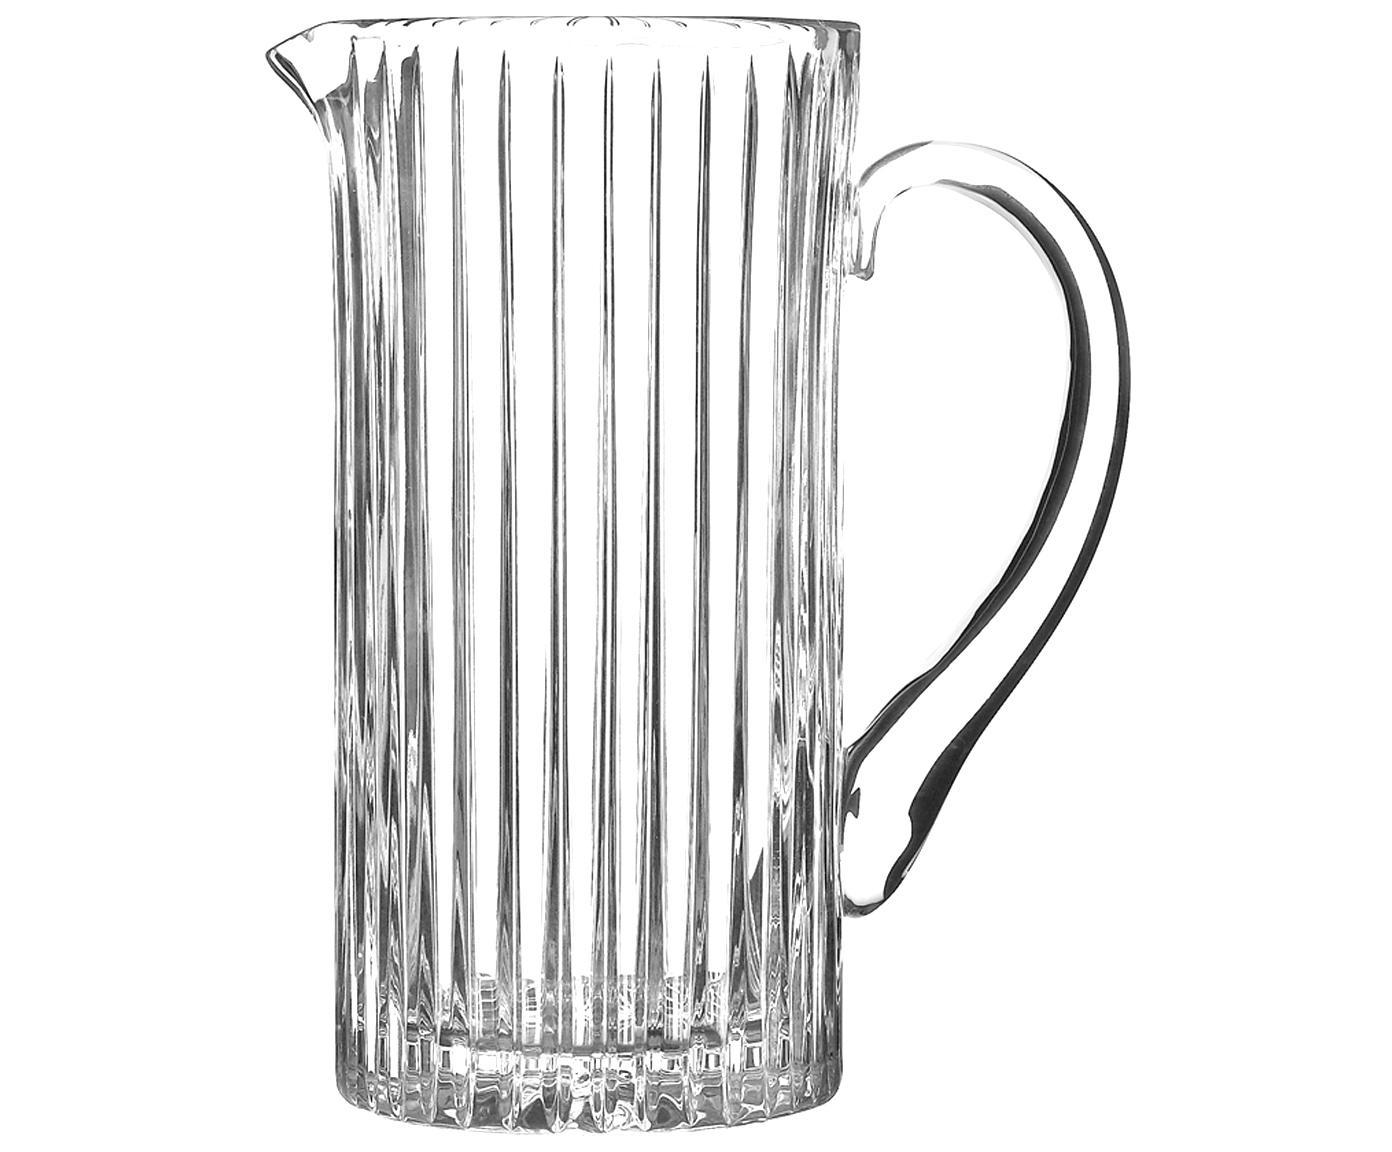 Kristall-Krug Timeless, Luxion-Kristallglas, Transparent, 1.2 L